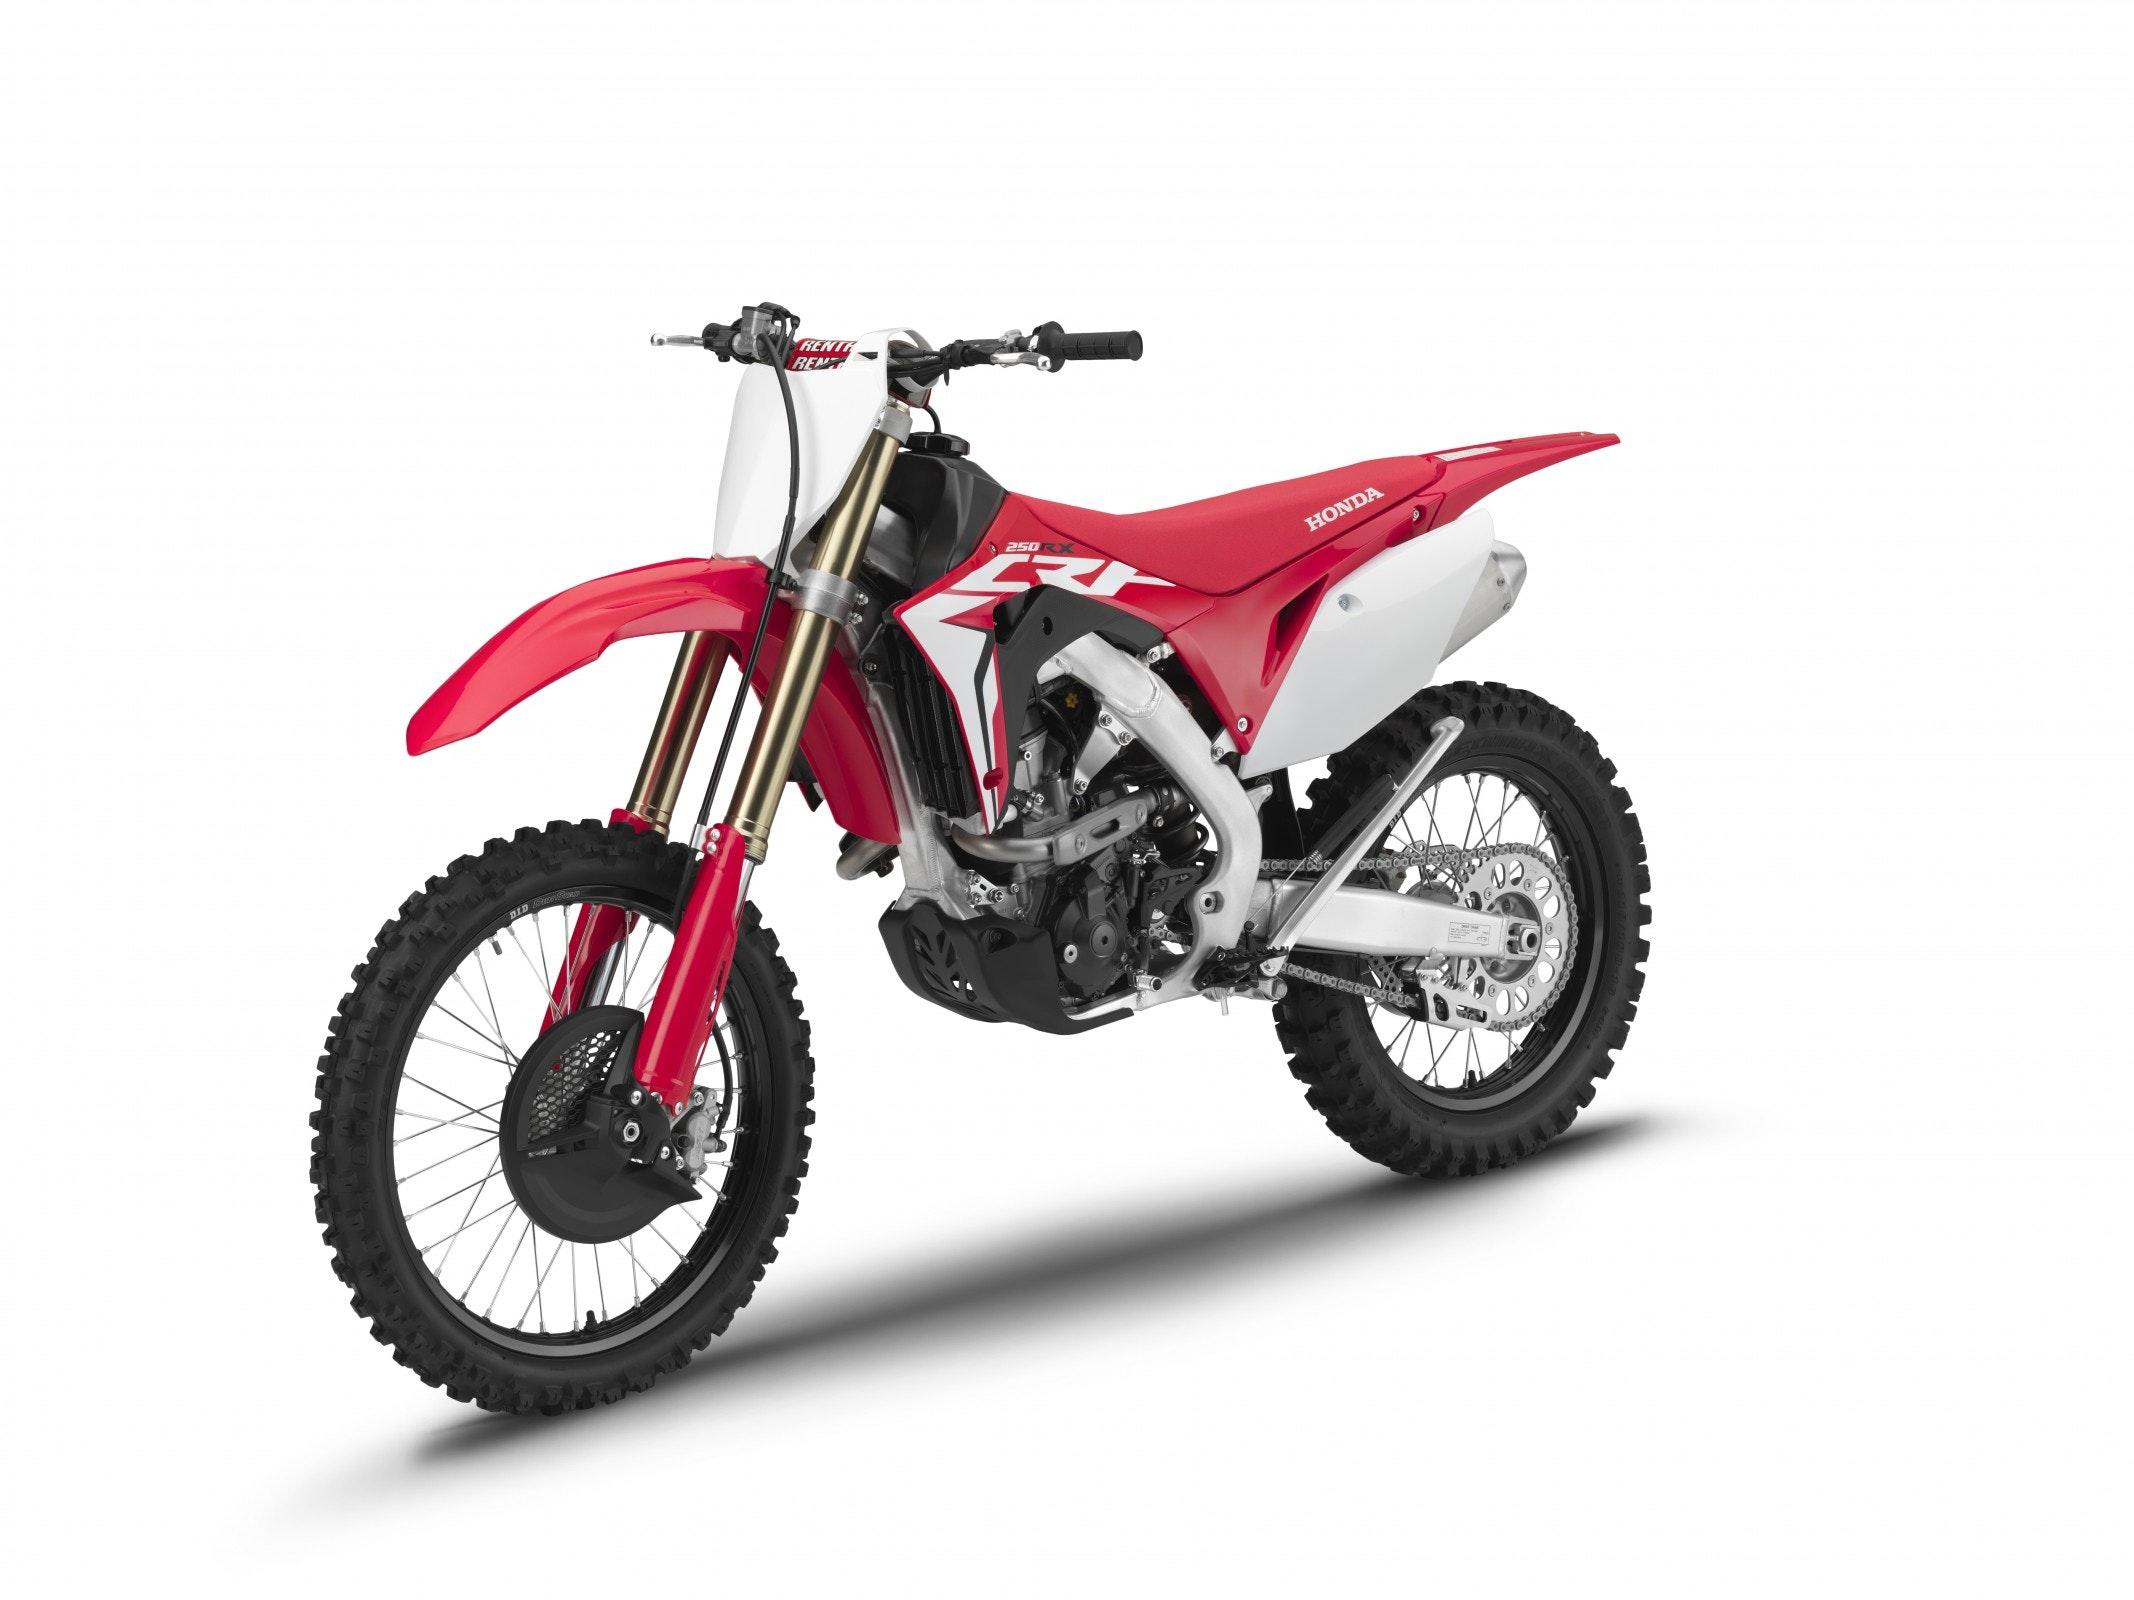 19_Honda_CRF250RX_FL34